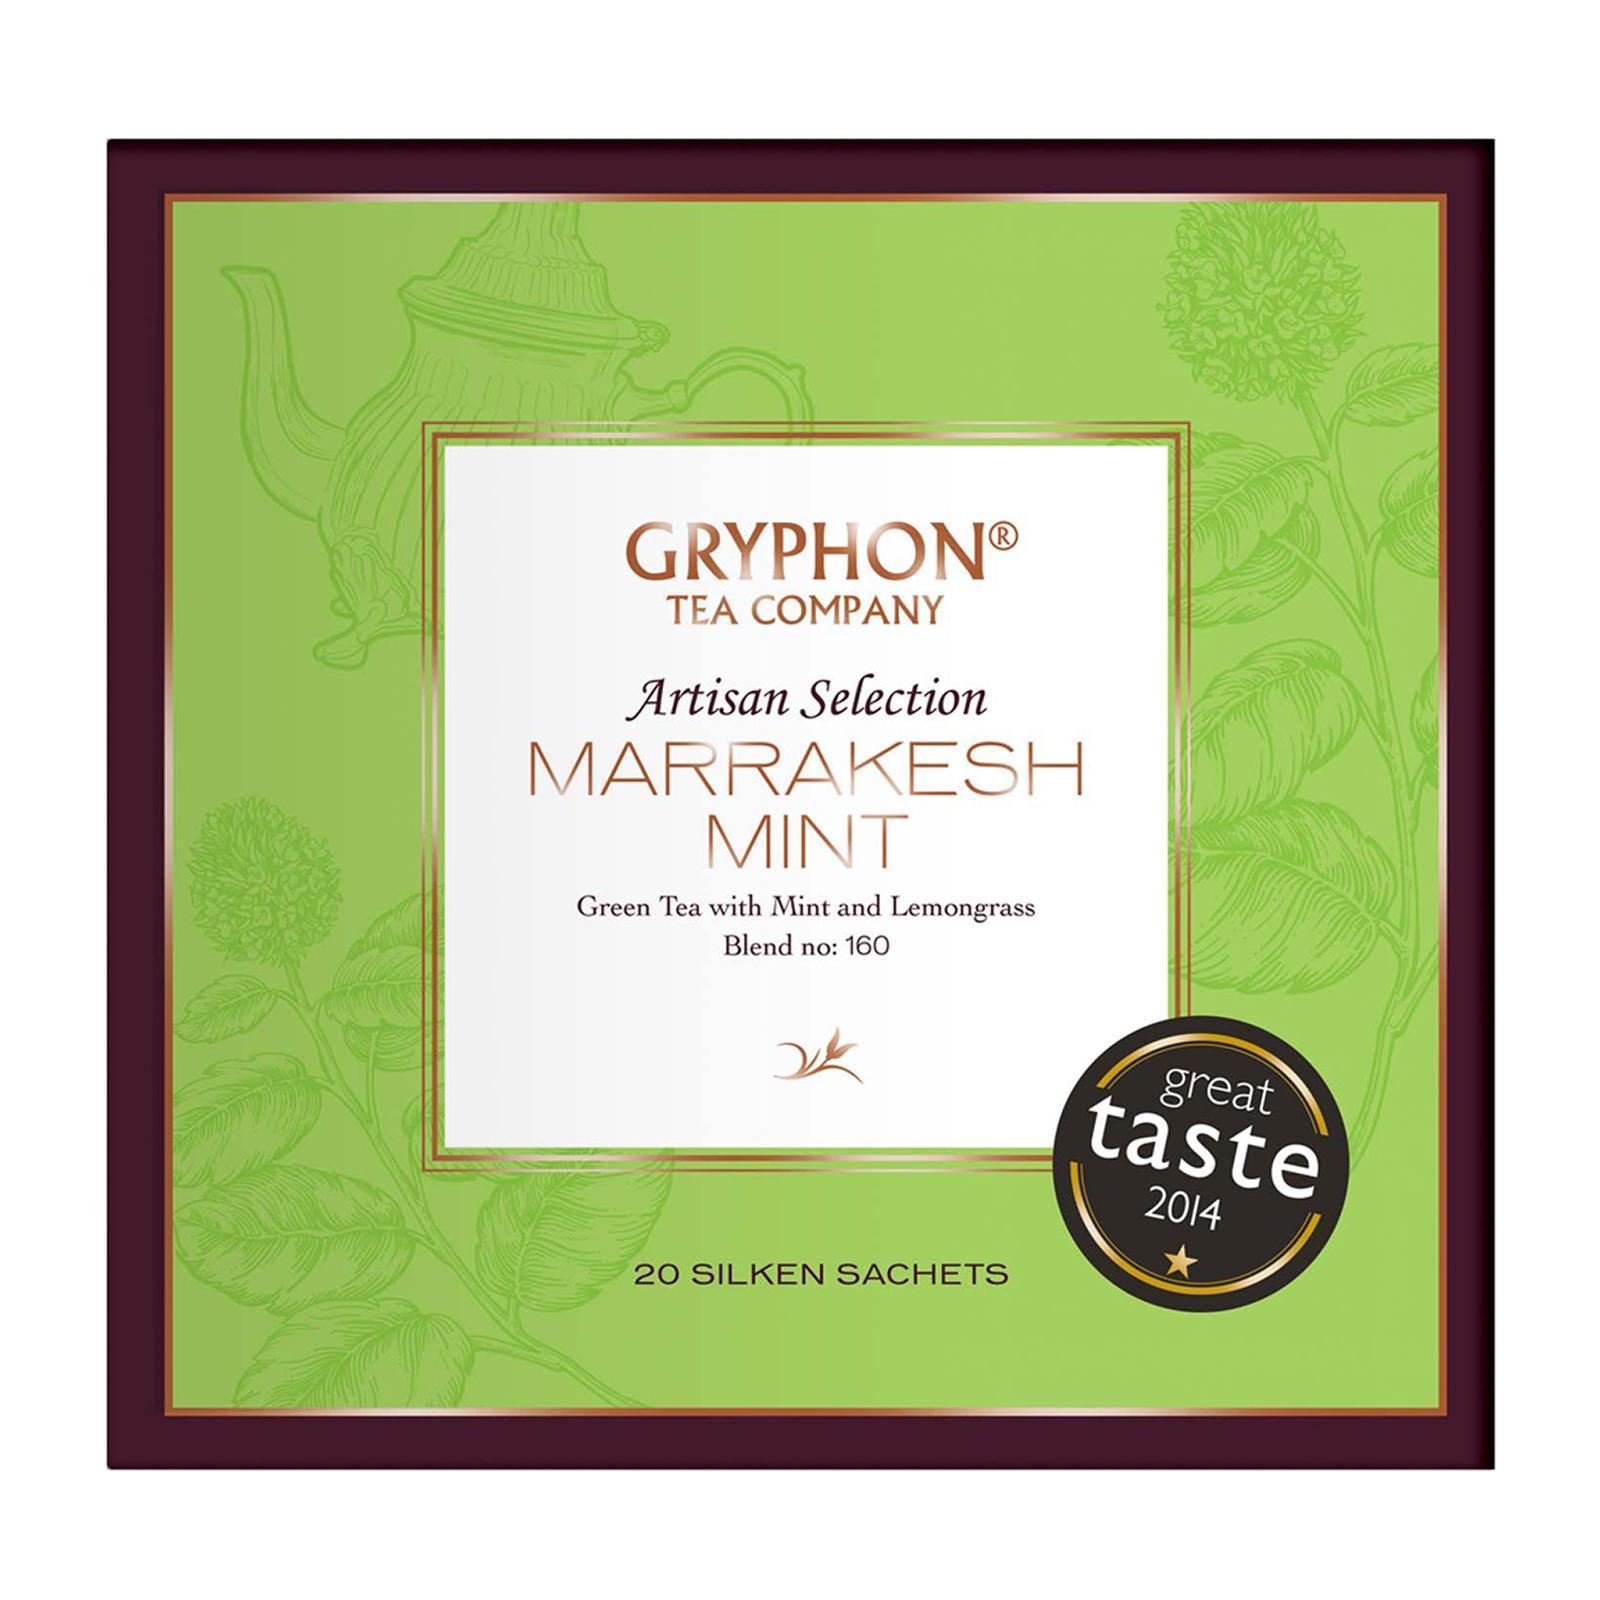 Gryphon Marrakesh Mint Tea By Redmart.